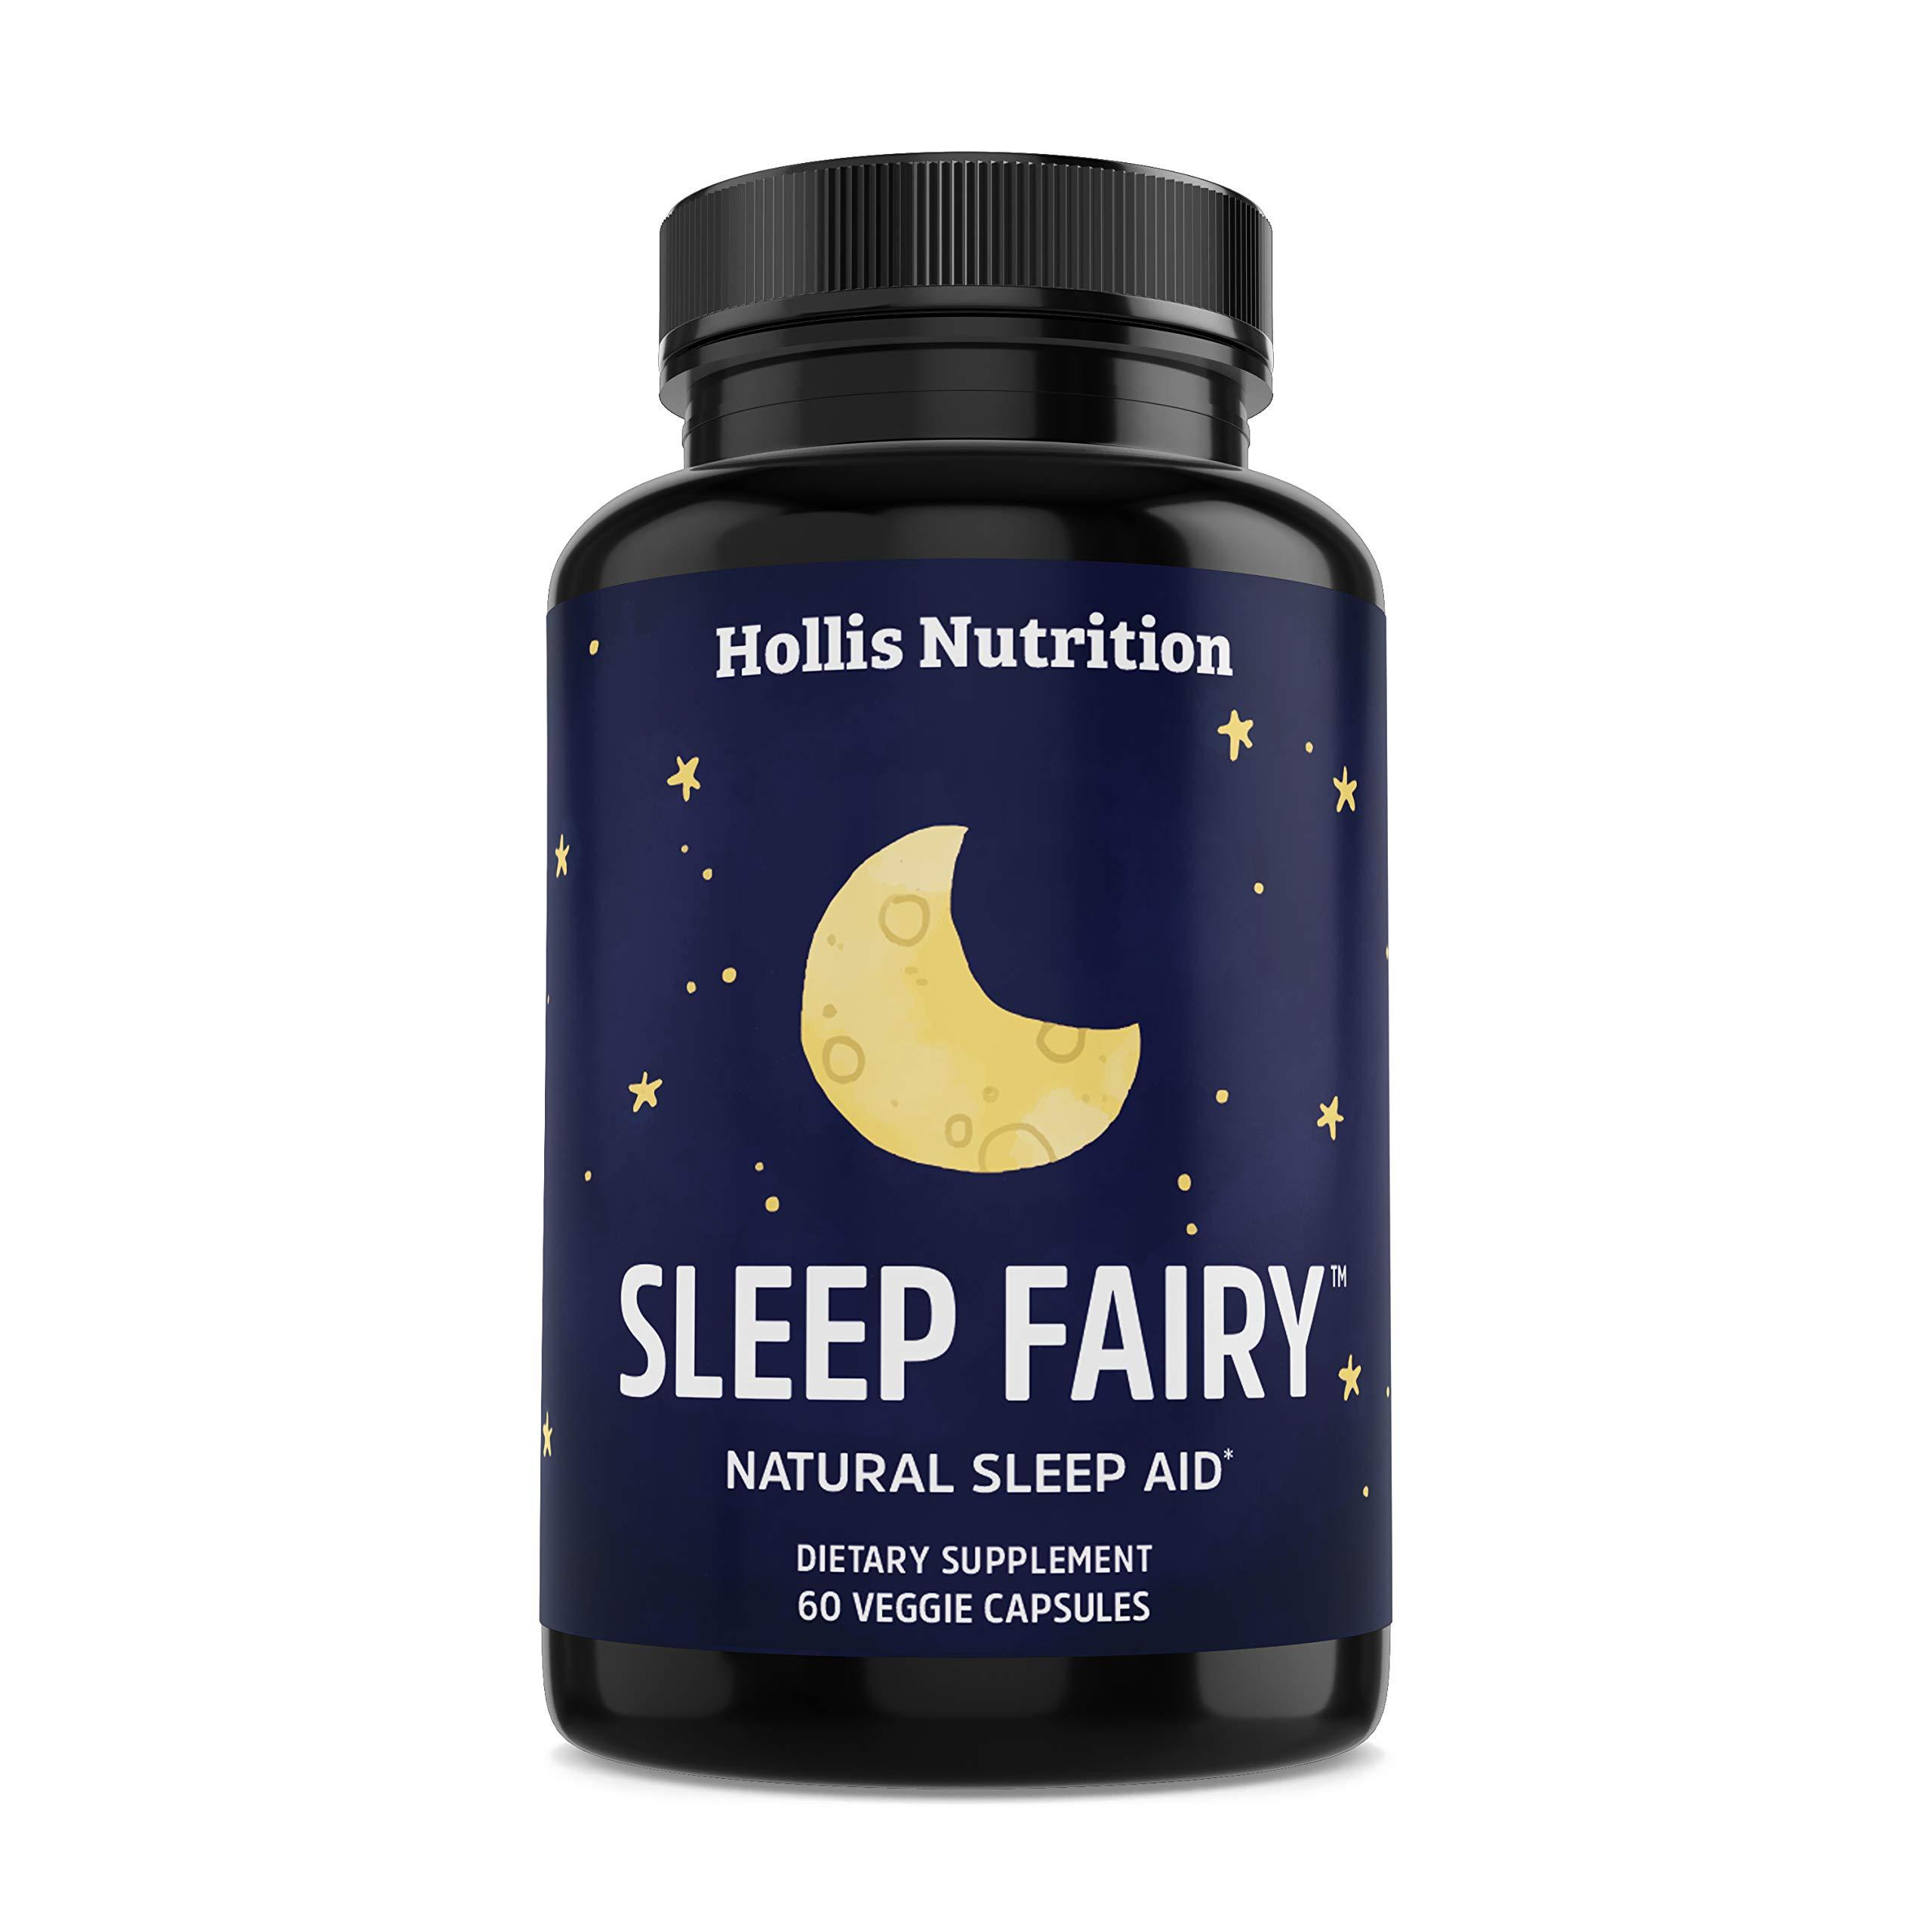 SLEEP FAIRYTM Natural Sleep Aid